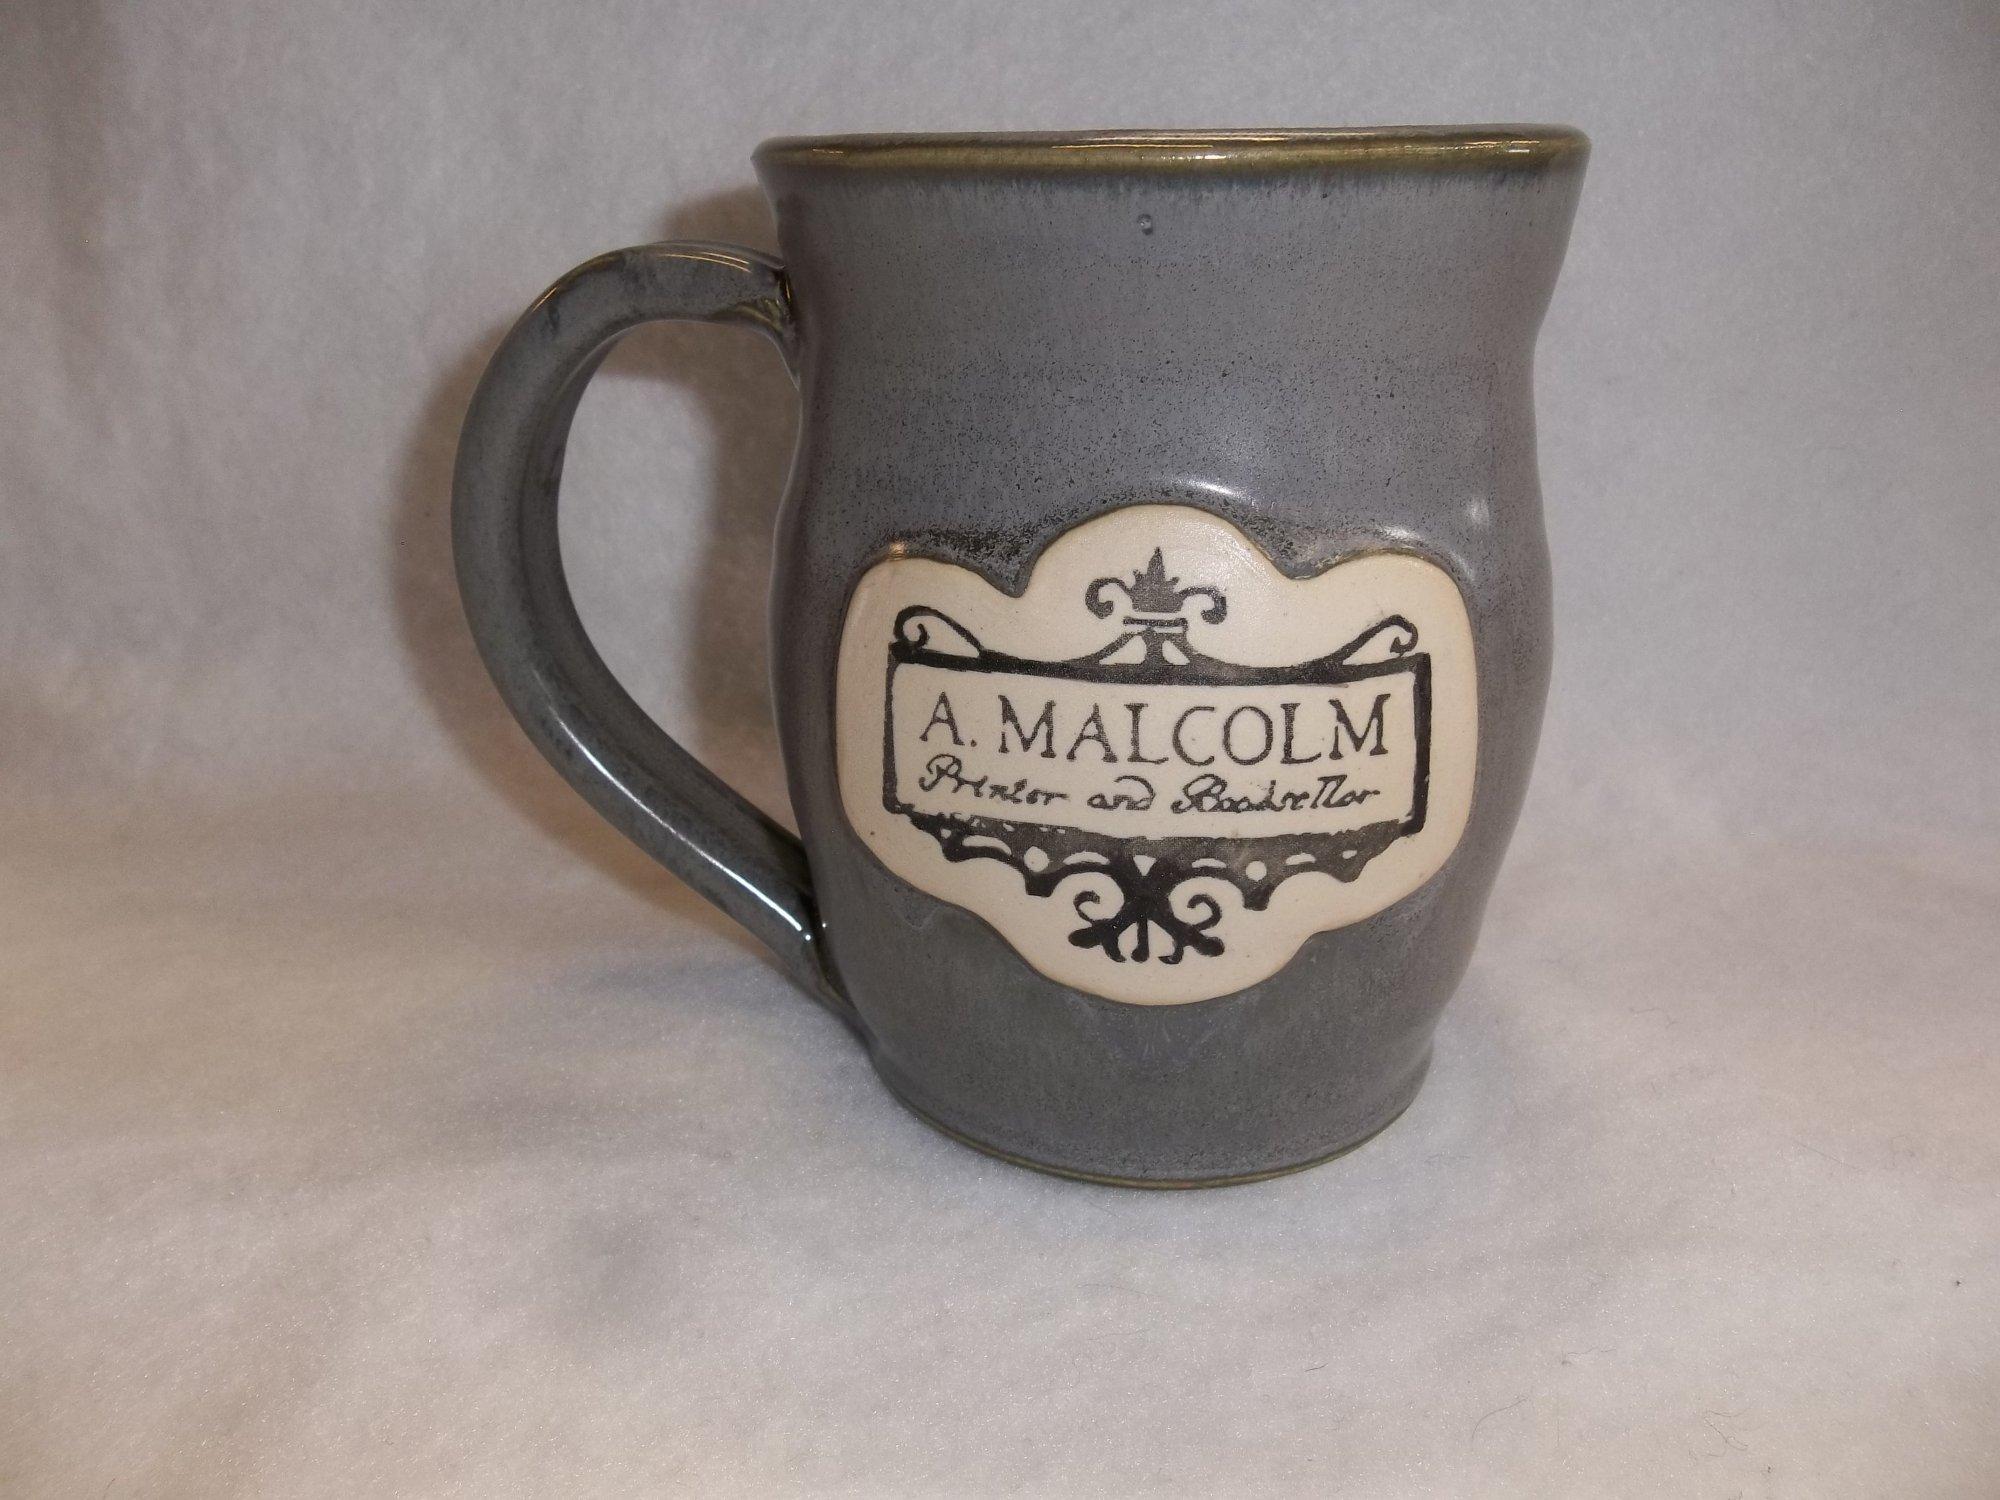 A Malcolm Mug